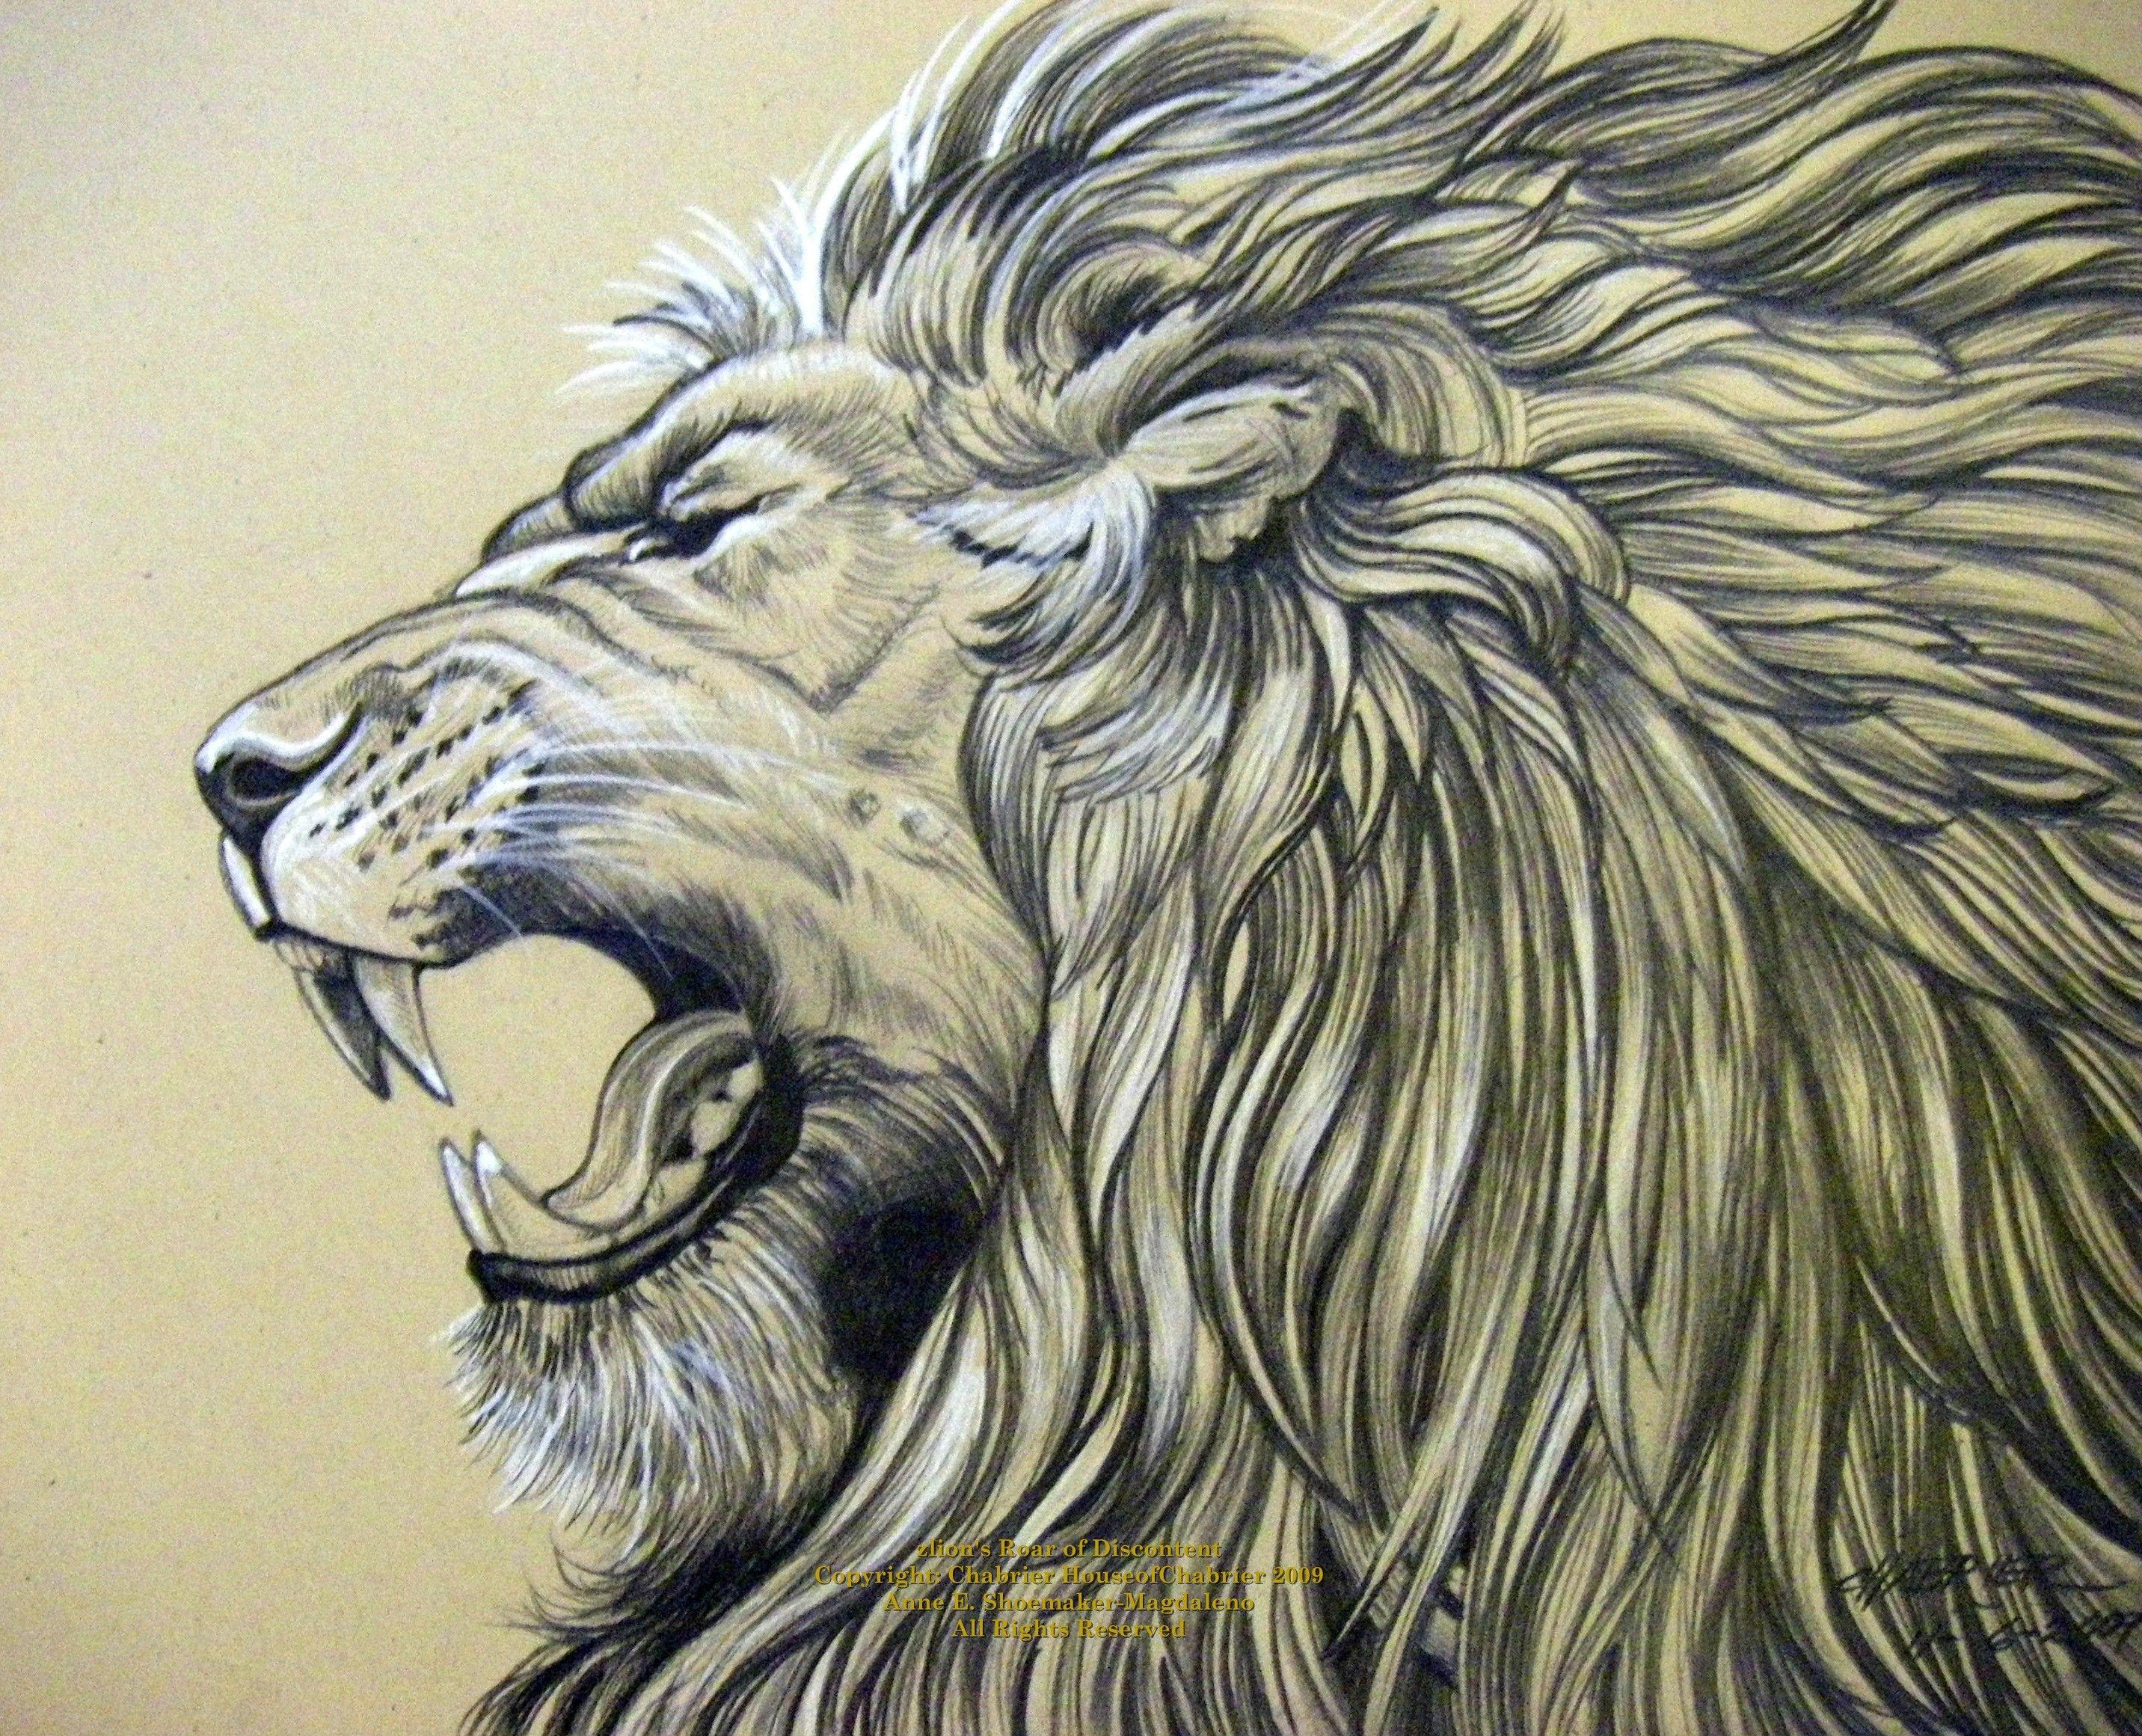 2864x2321 Pencil Drawings Of Jesus Lion Roar By Houseofchabrier